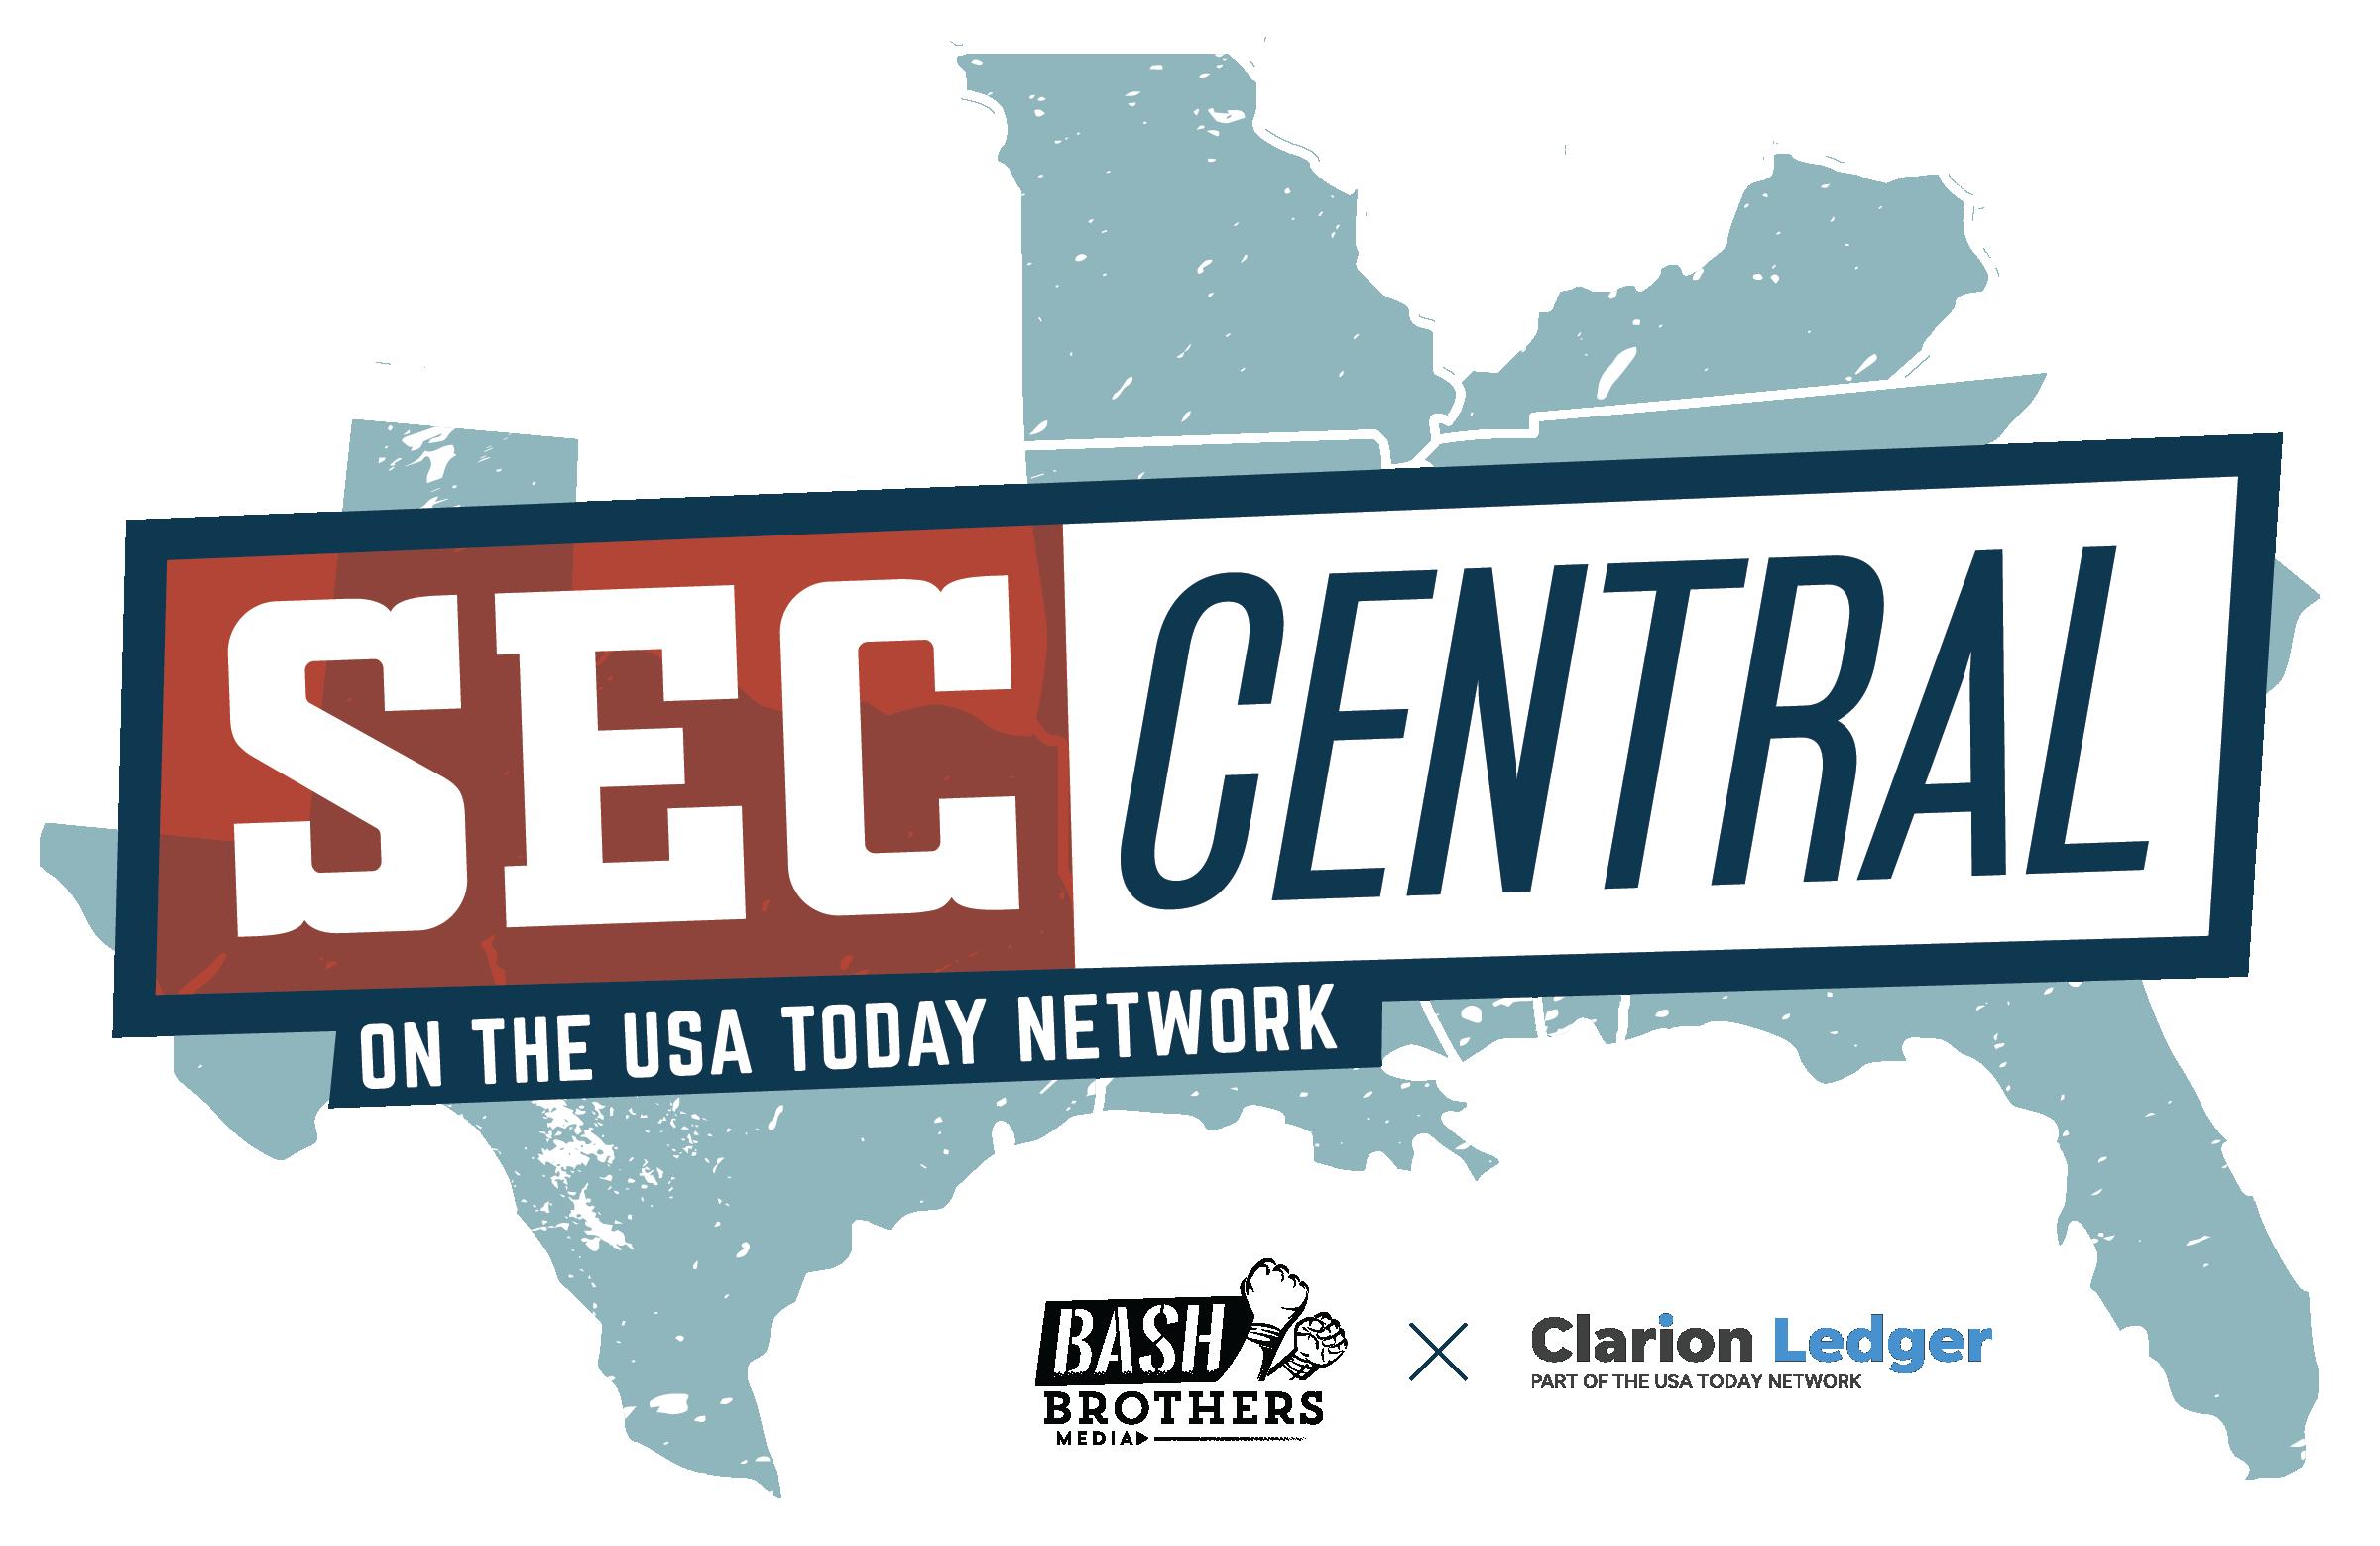 SEC Central 7-01